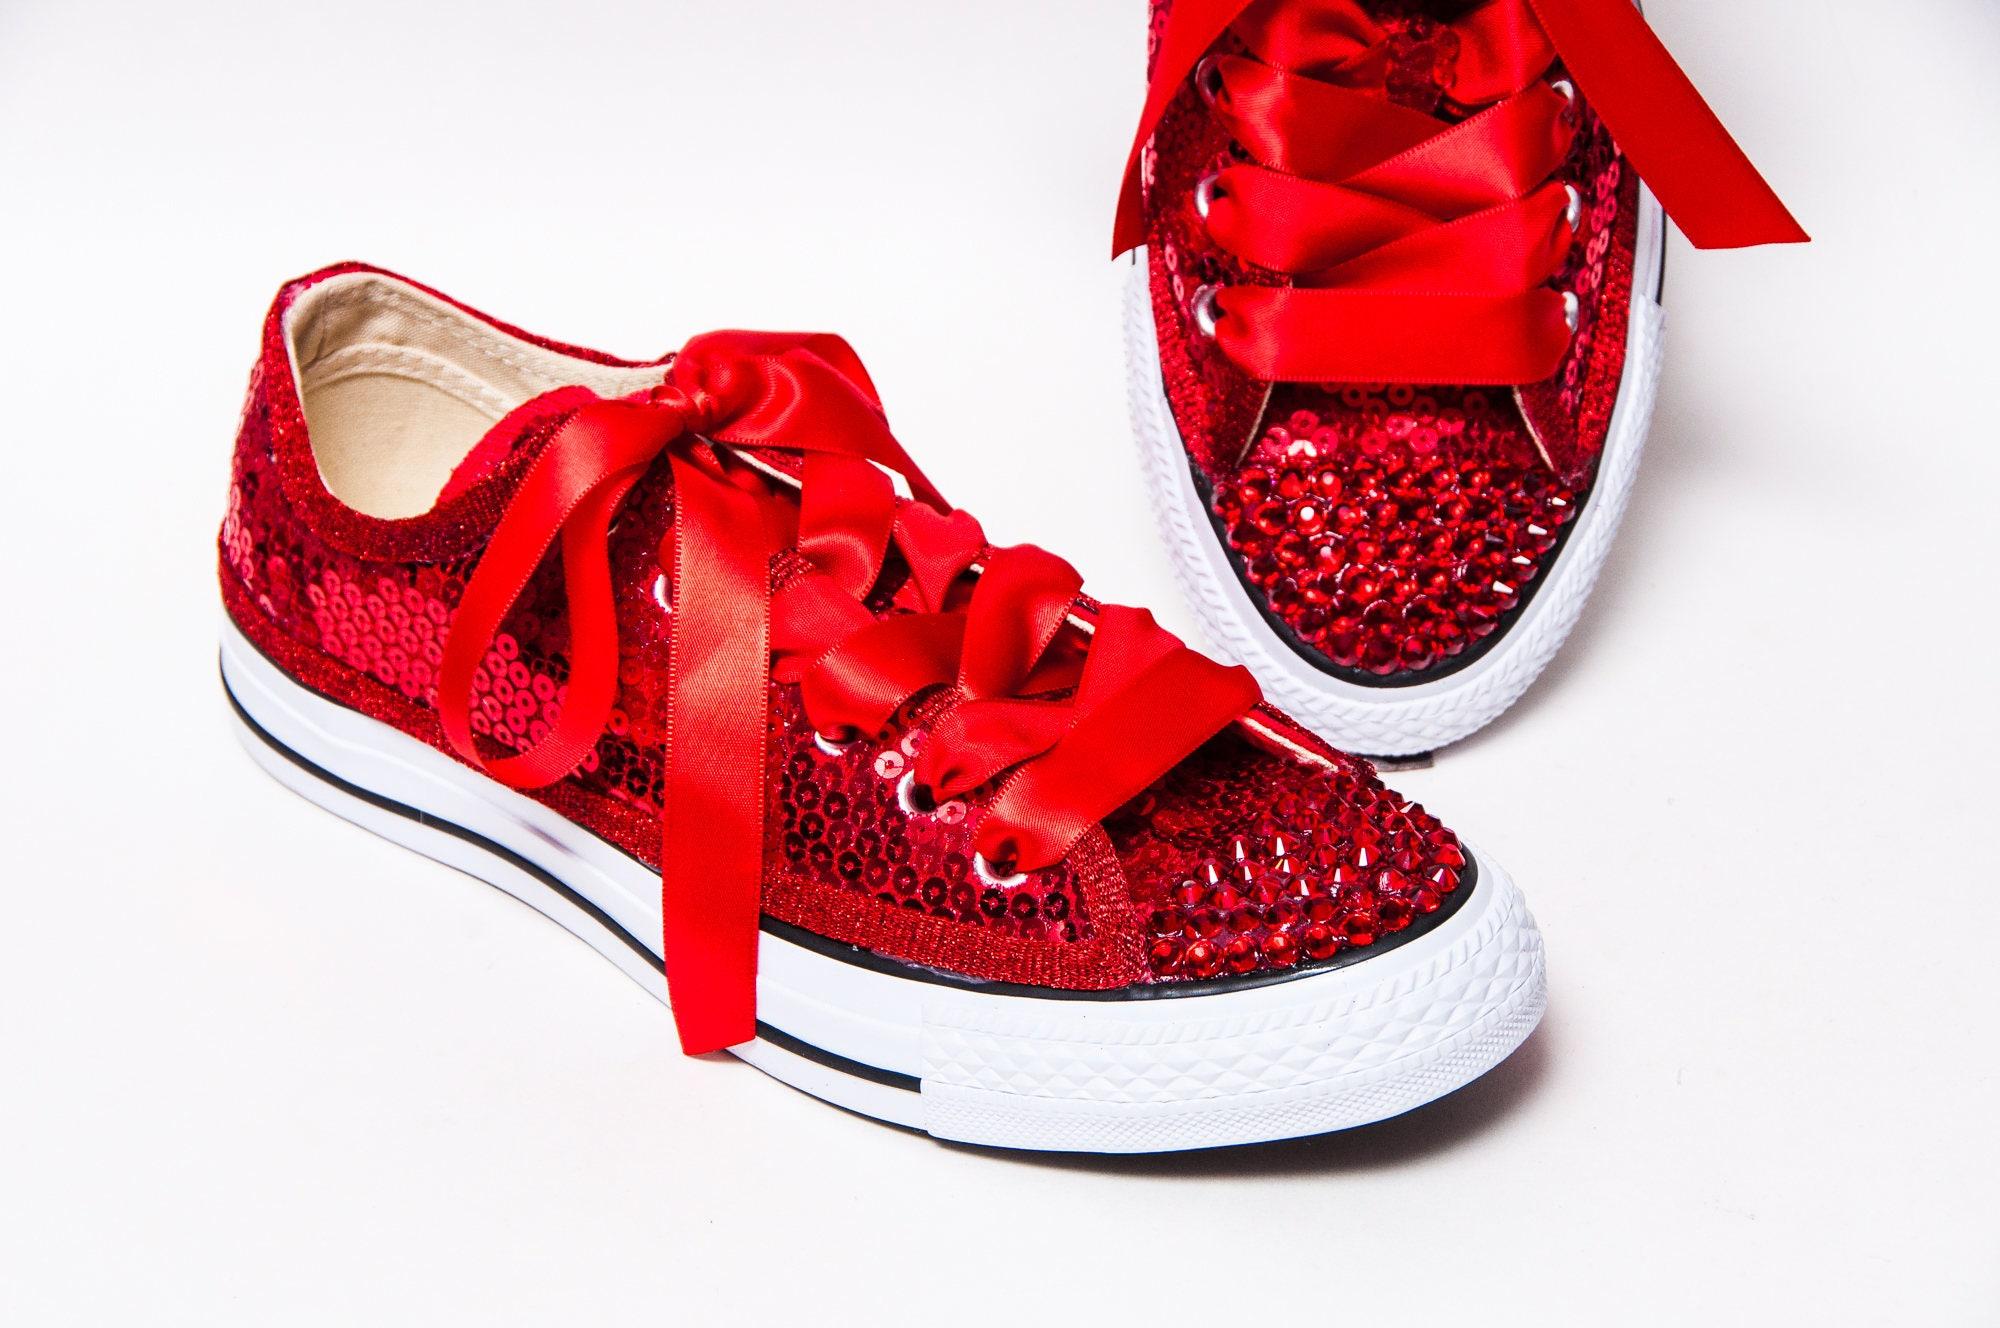 c85d128b163ec4 Sequin Red Canvas Converse® Low Top Sneakers Tennis Shoes